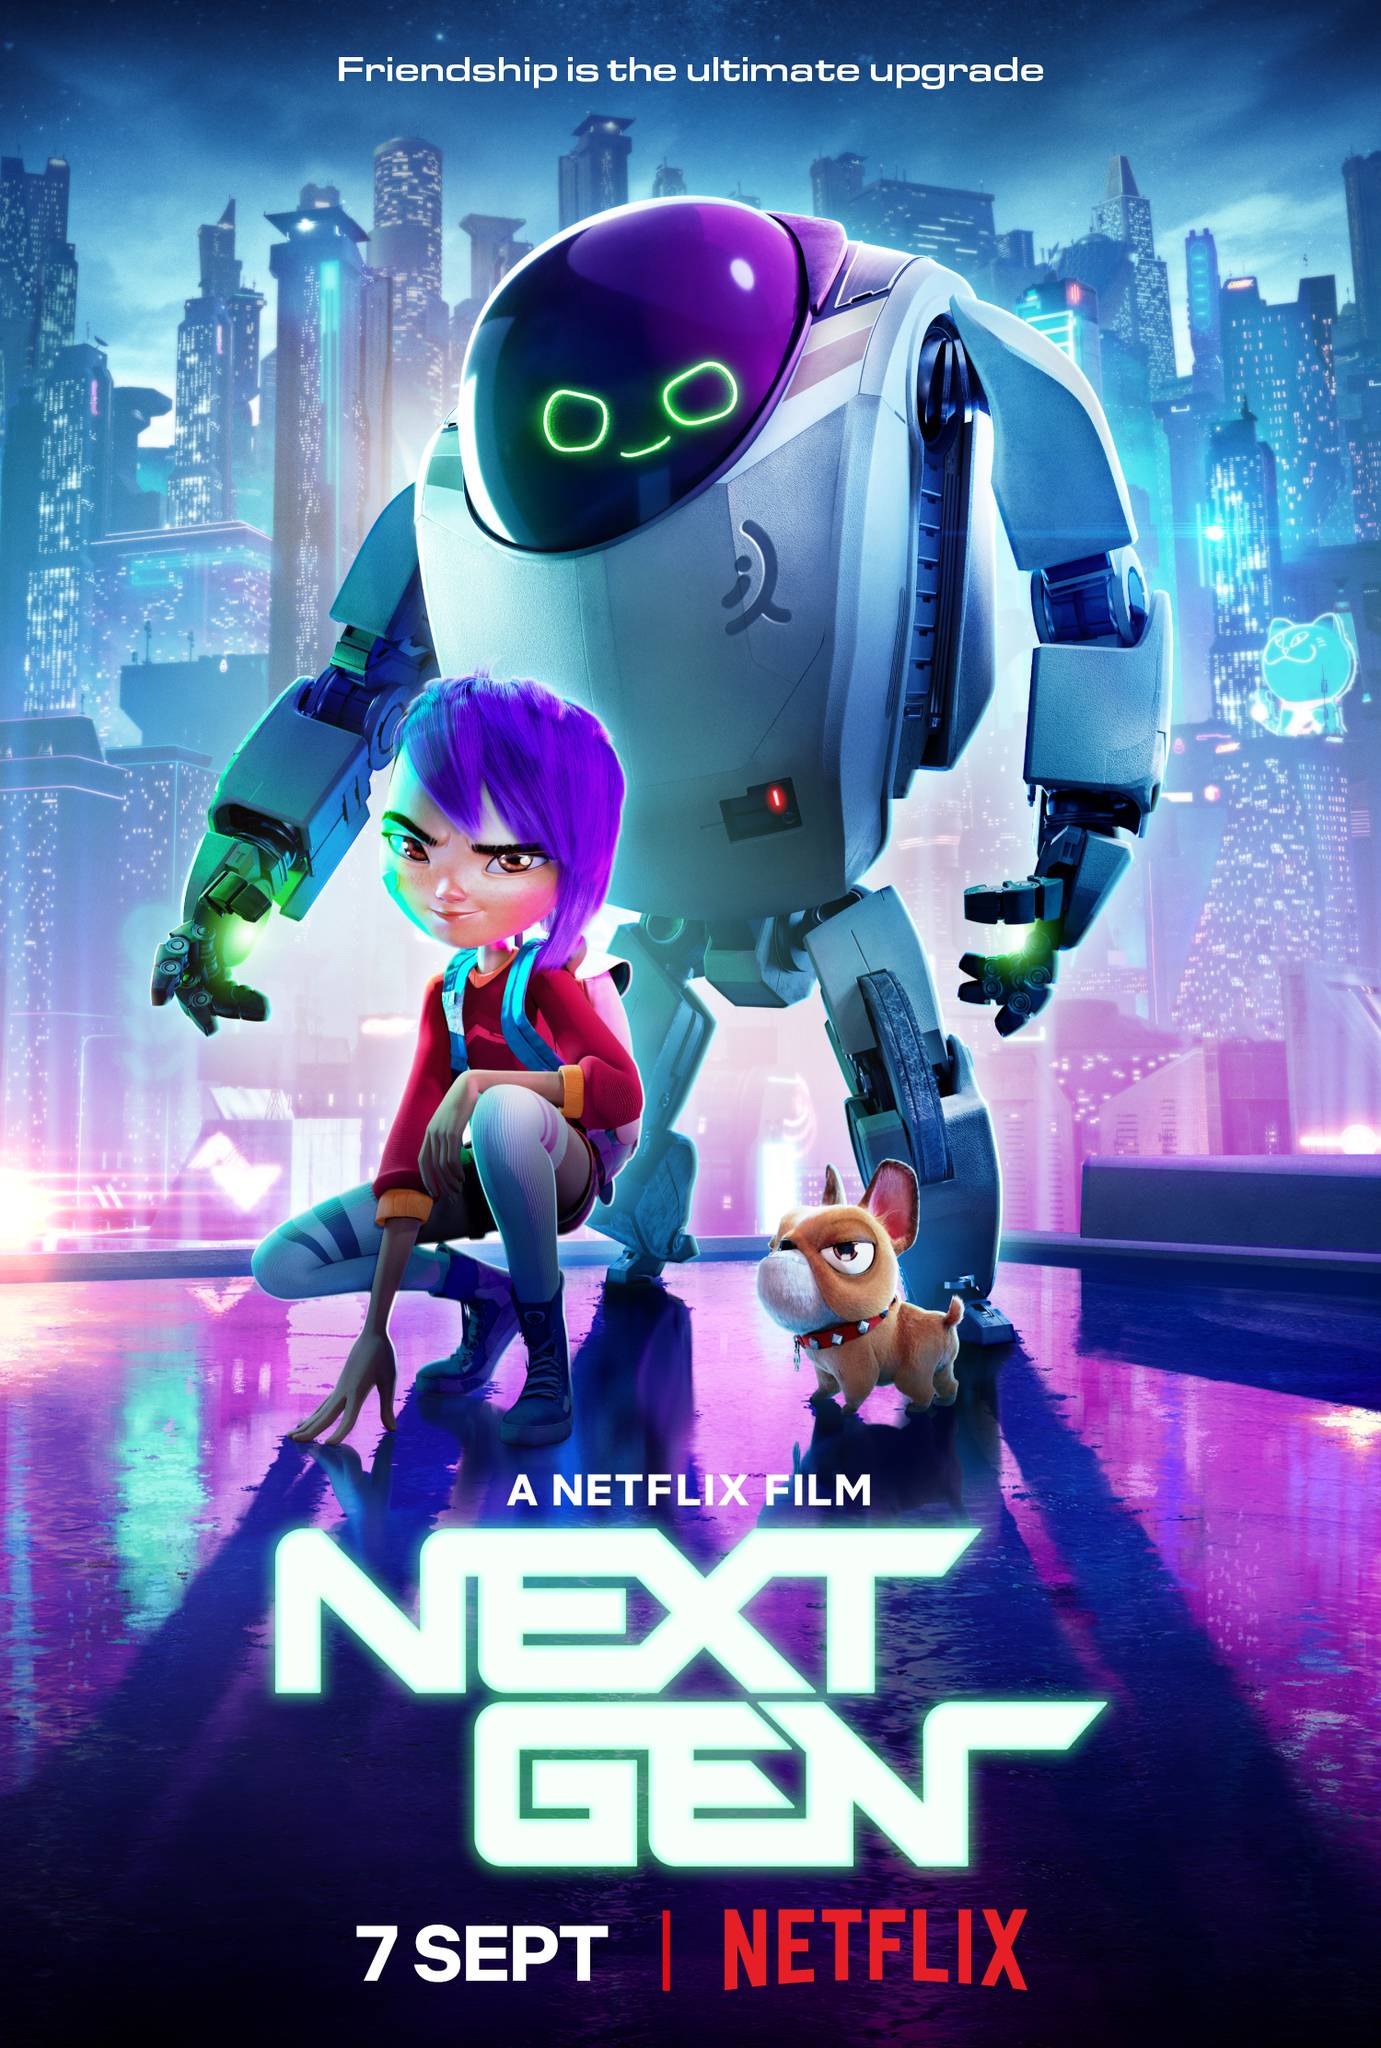 [Netflix] Next Gen เน็กซ์ เจน พากย์ไทย